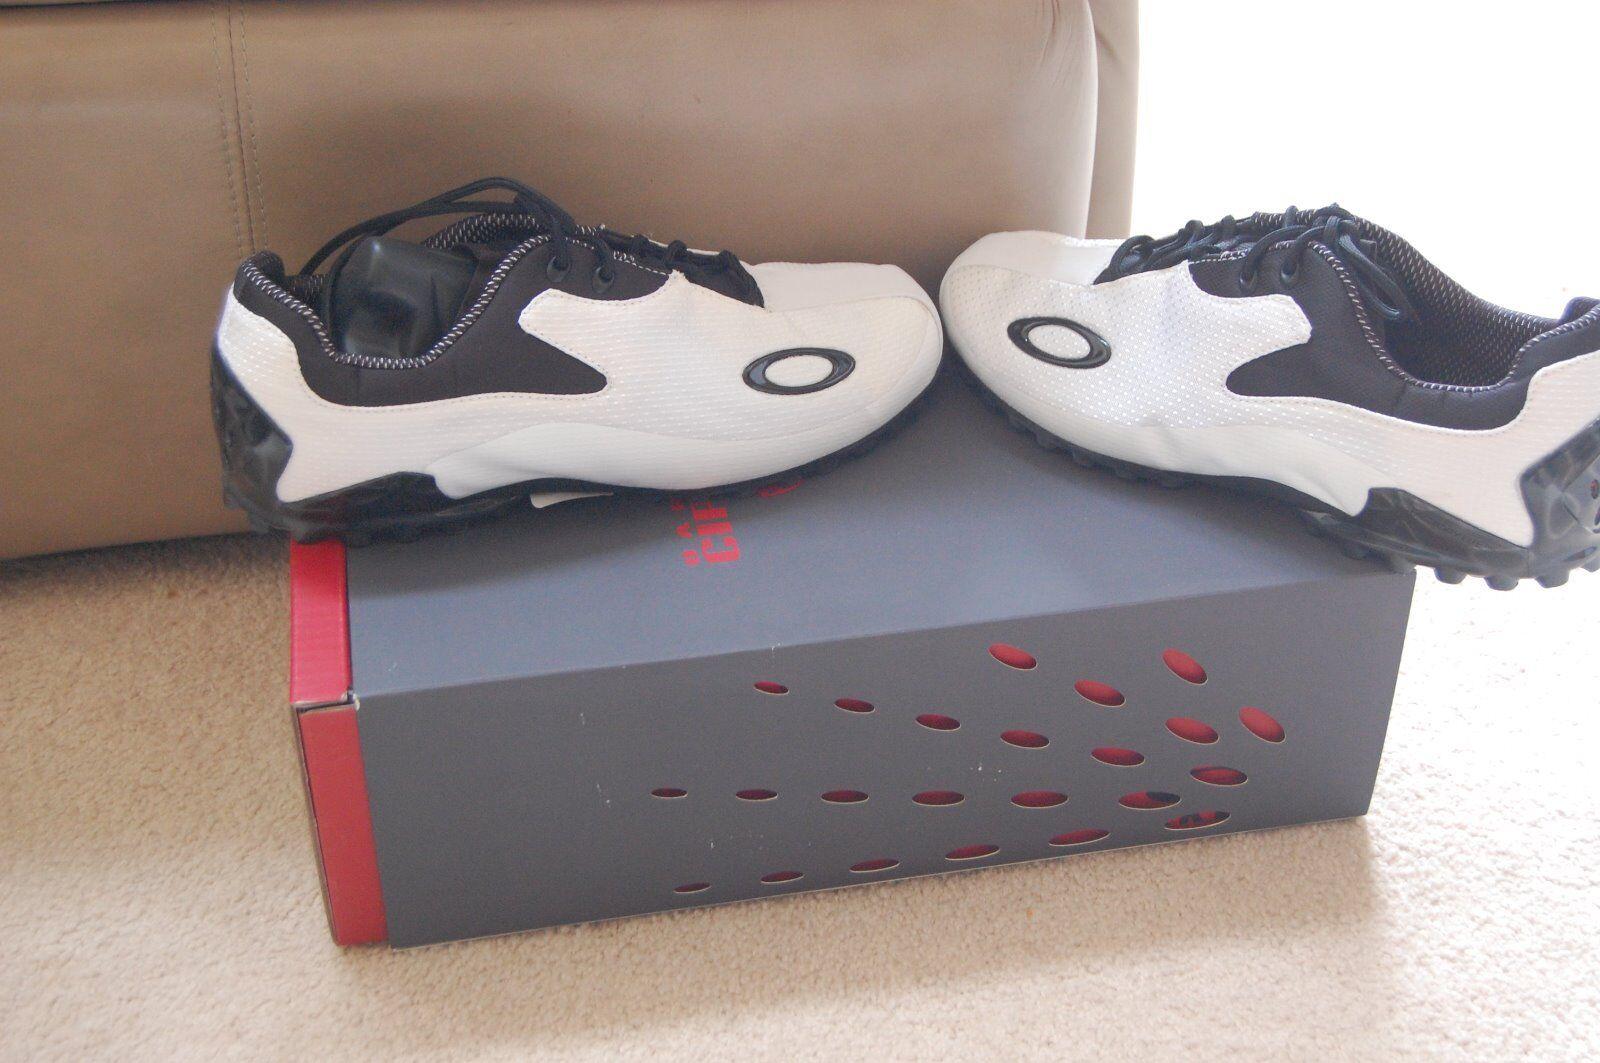 Scarpe casual da uomo NEW Oakley CIPHER   Golf Shoe  SZ 9 W White Oakley CIPHER